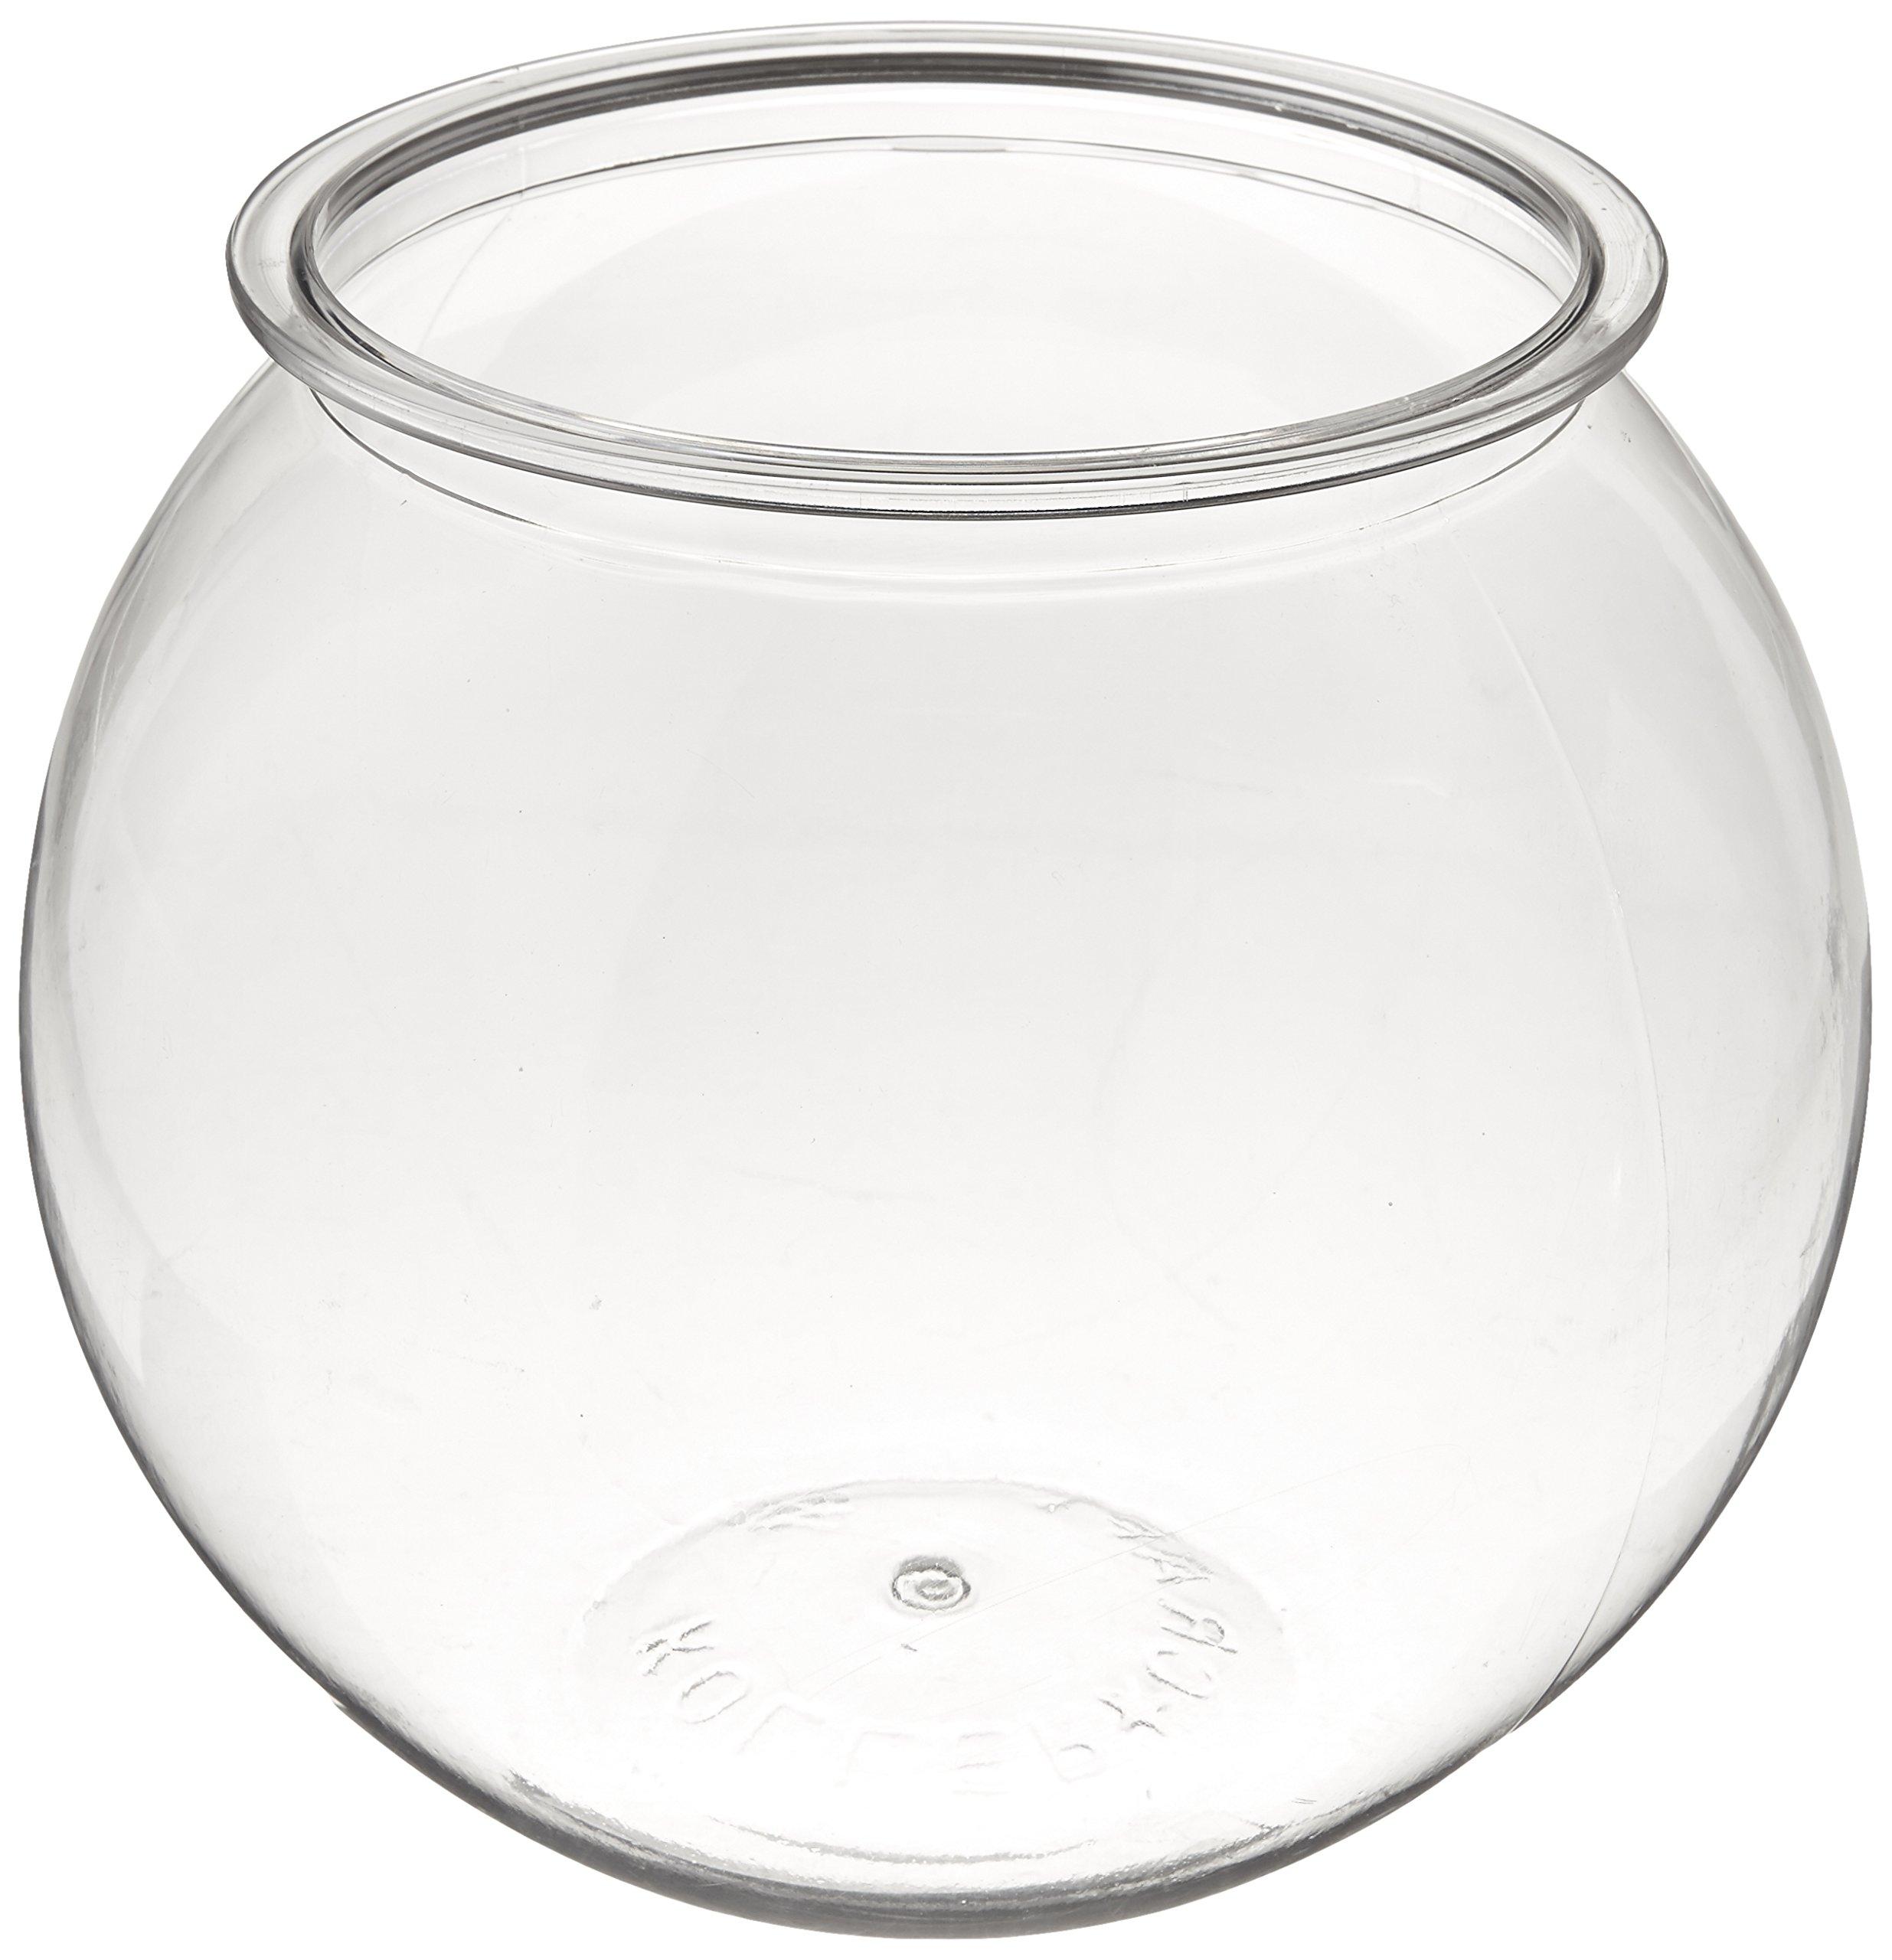 Koller Products Panaview 1-Gallon Globe Fish Bowl